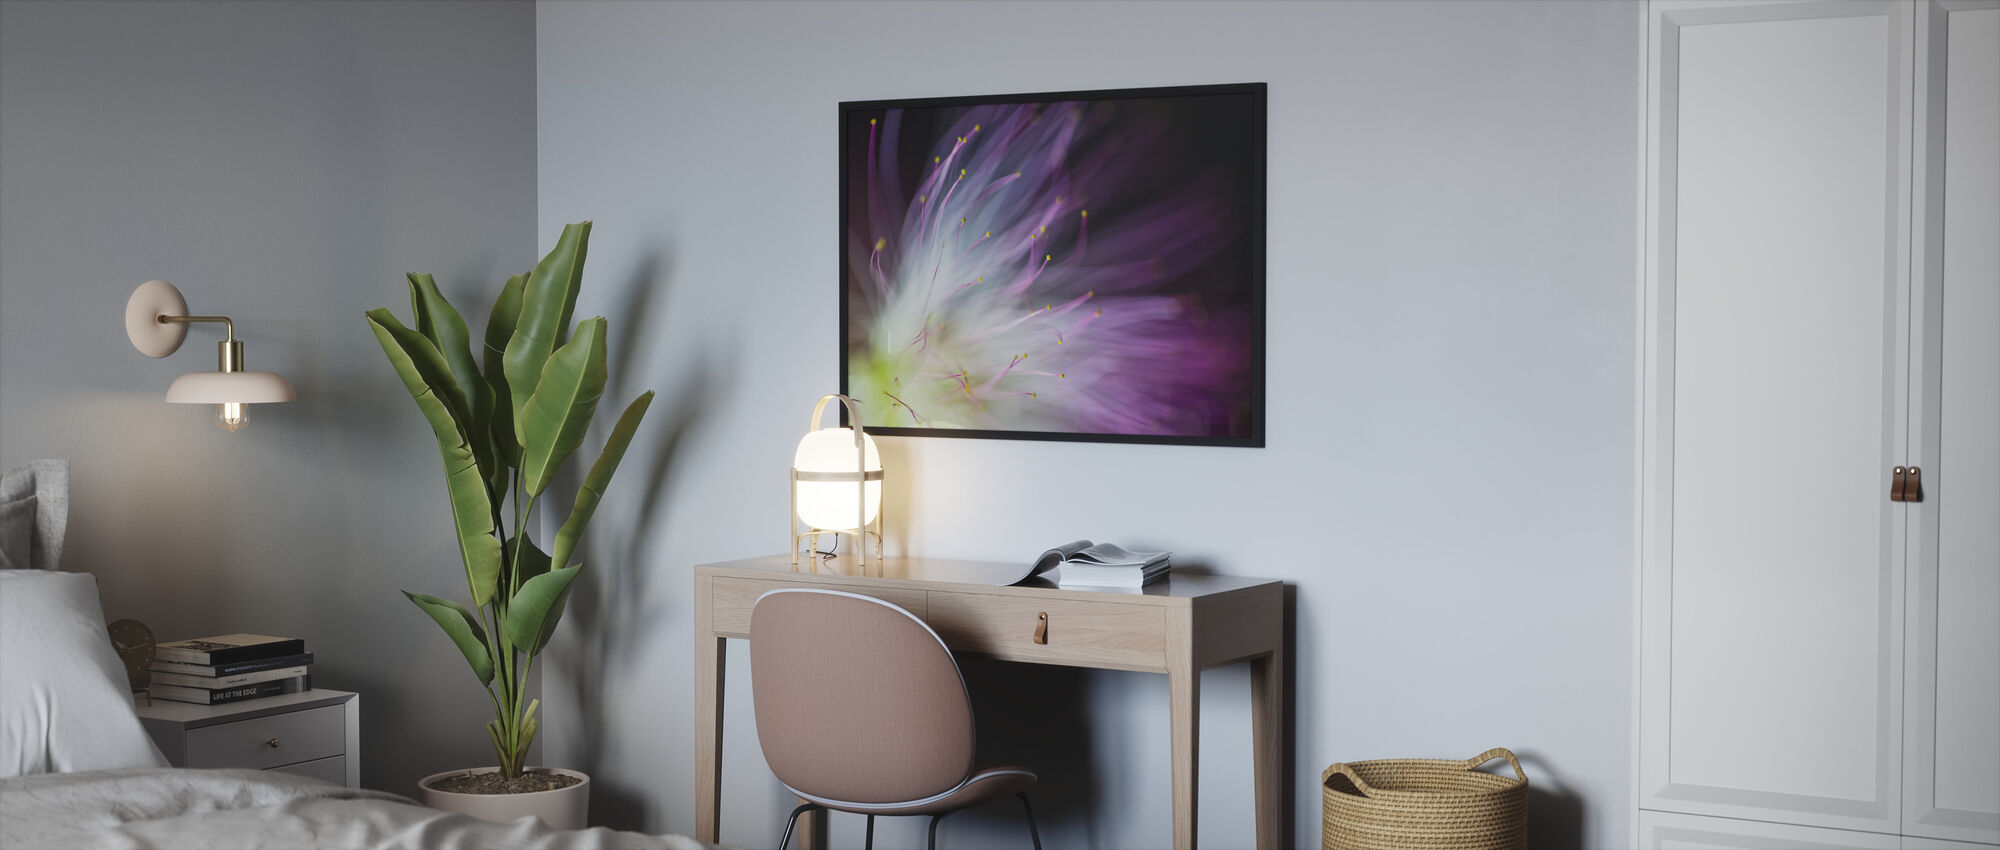 Will o he Wisp - Framed print - Bedroom